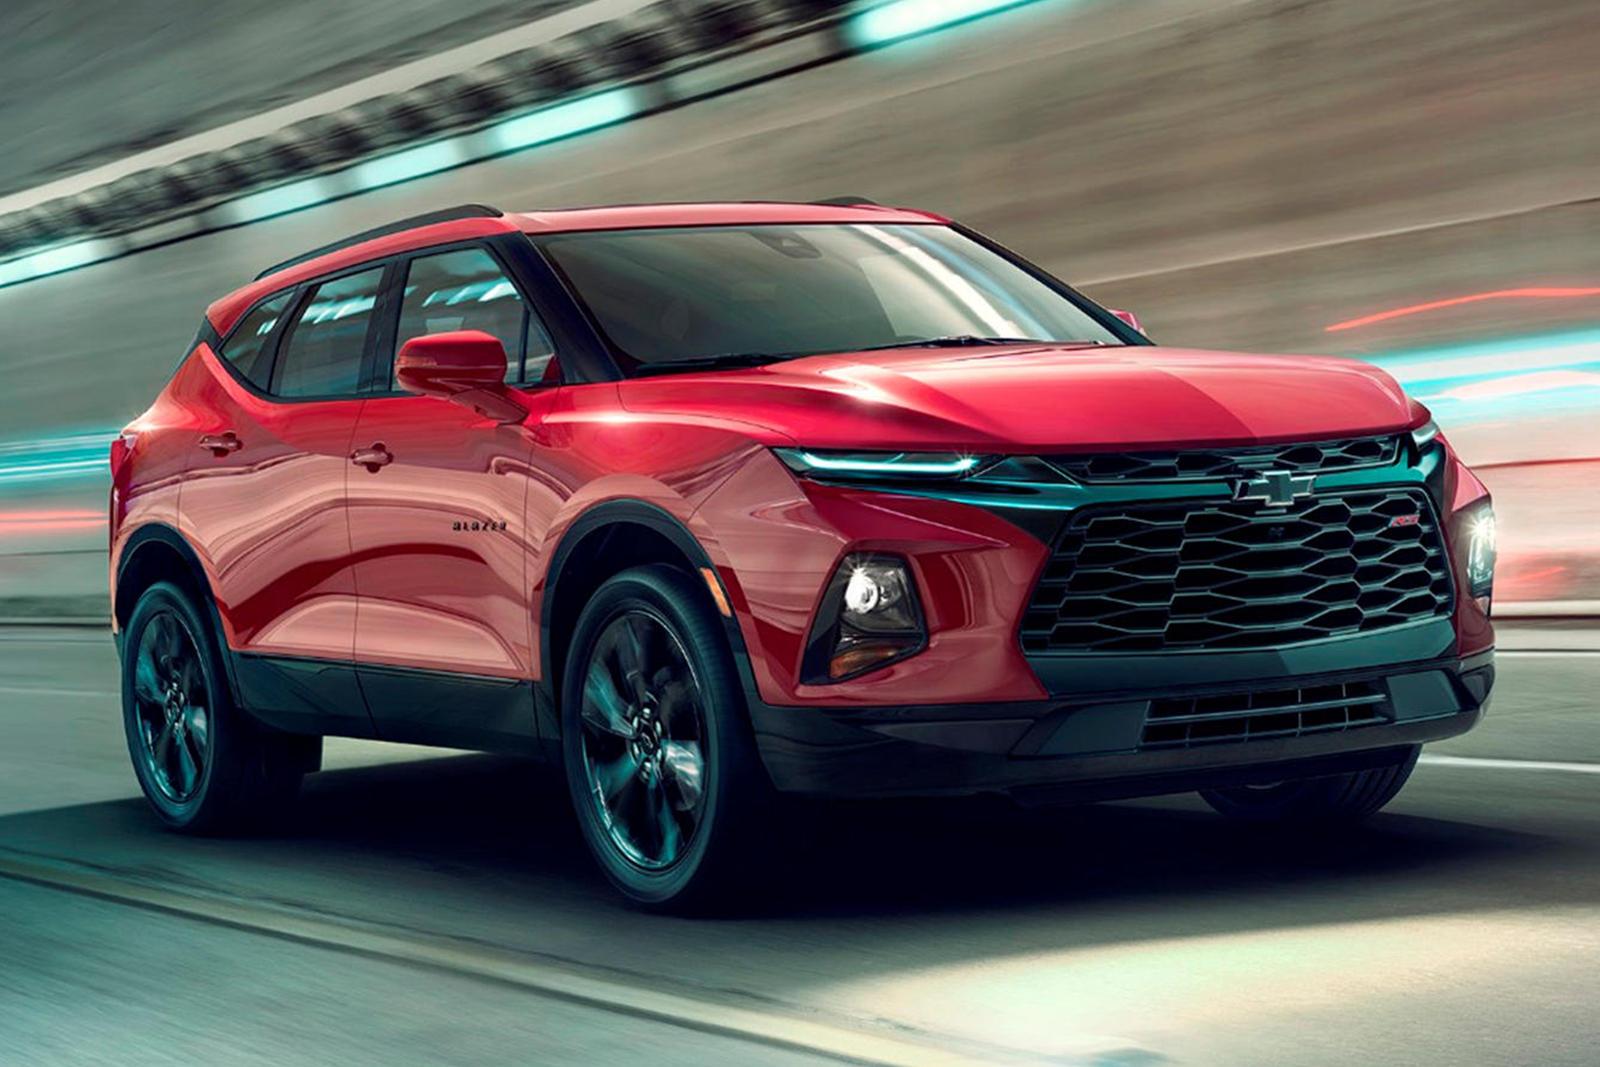 2020 Chevrolet Blazer Receiving A Slick Styling Upgrade